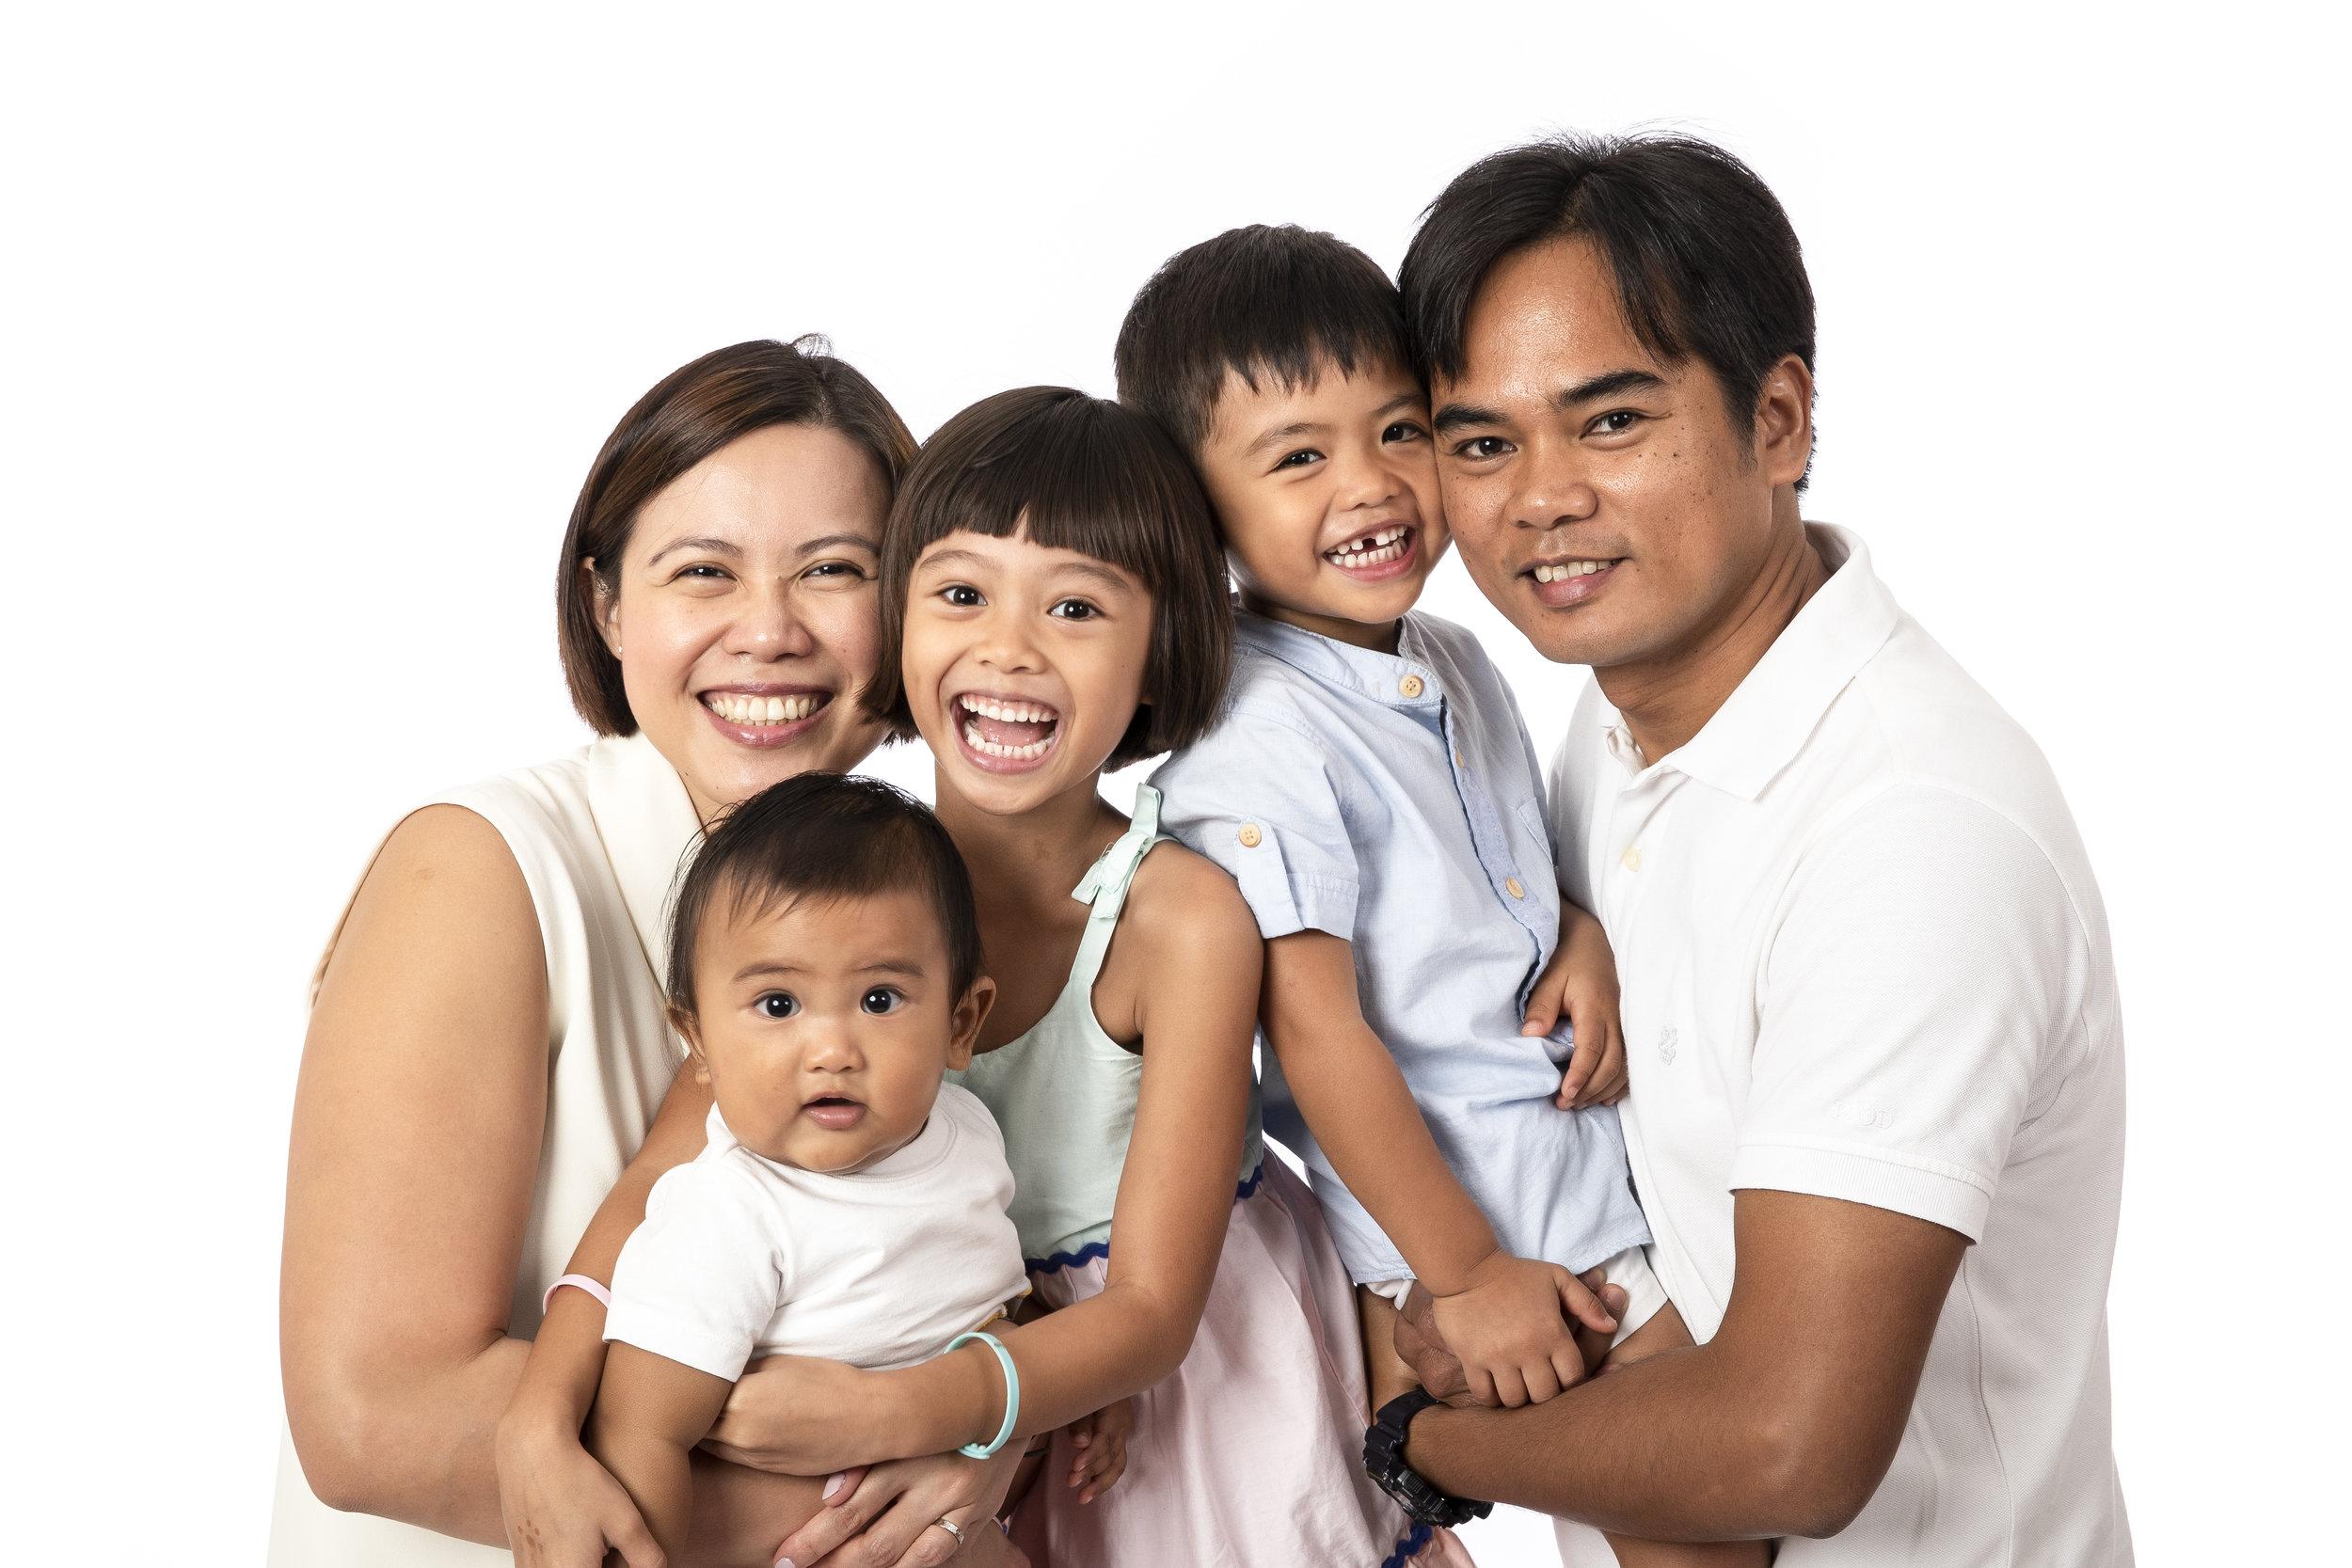 Singapore Family Photo Shoot Studio Vision Photography Daniel Parker